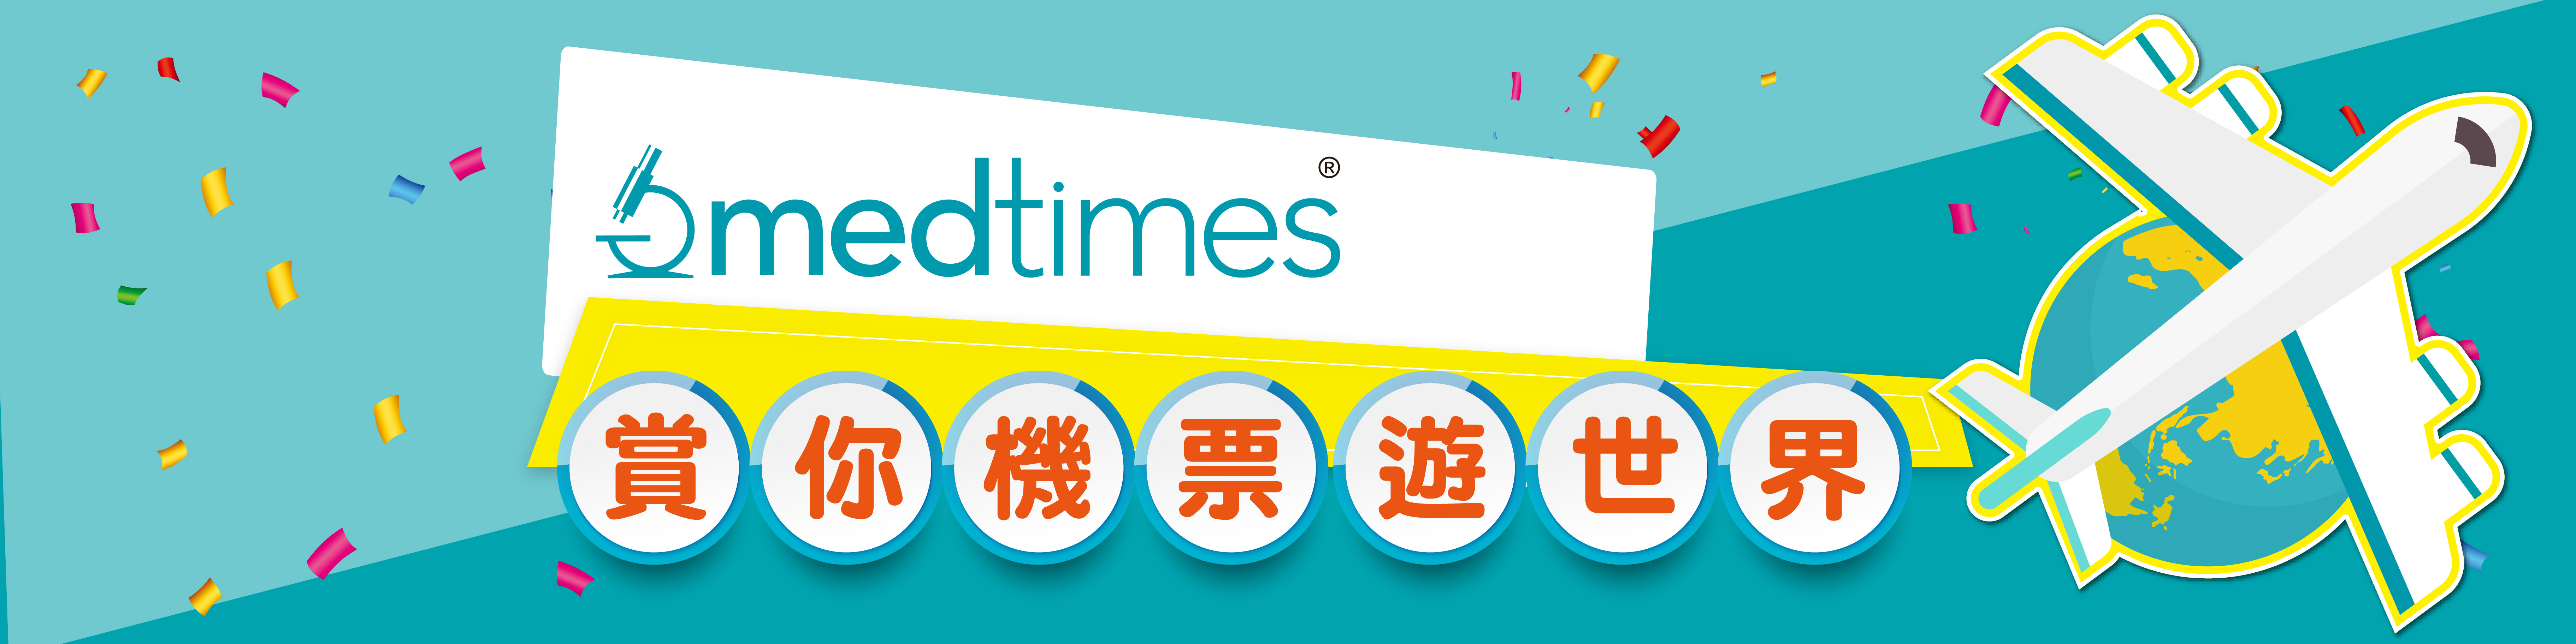 Medtimes 賞您機票遊世界